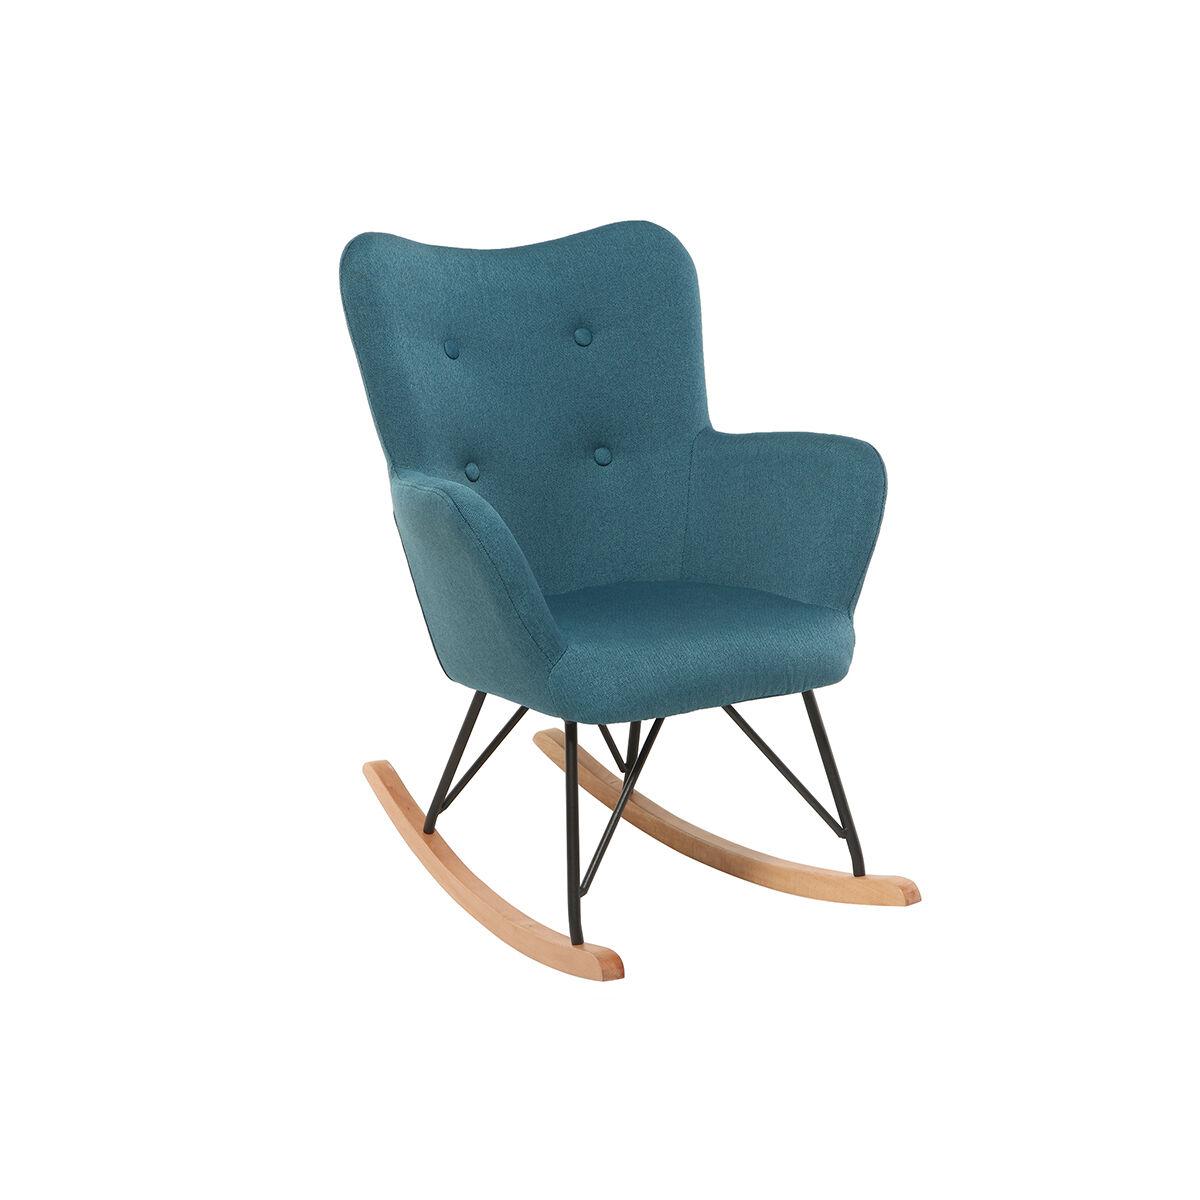 Miliboo Rocking chair design tissu bleu canard pieds métal et chêne BABY BRISTOL